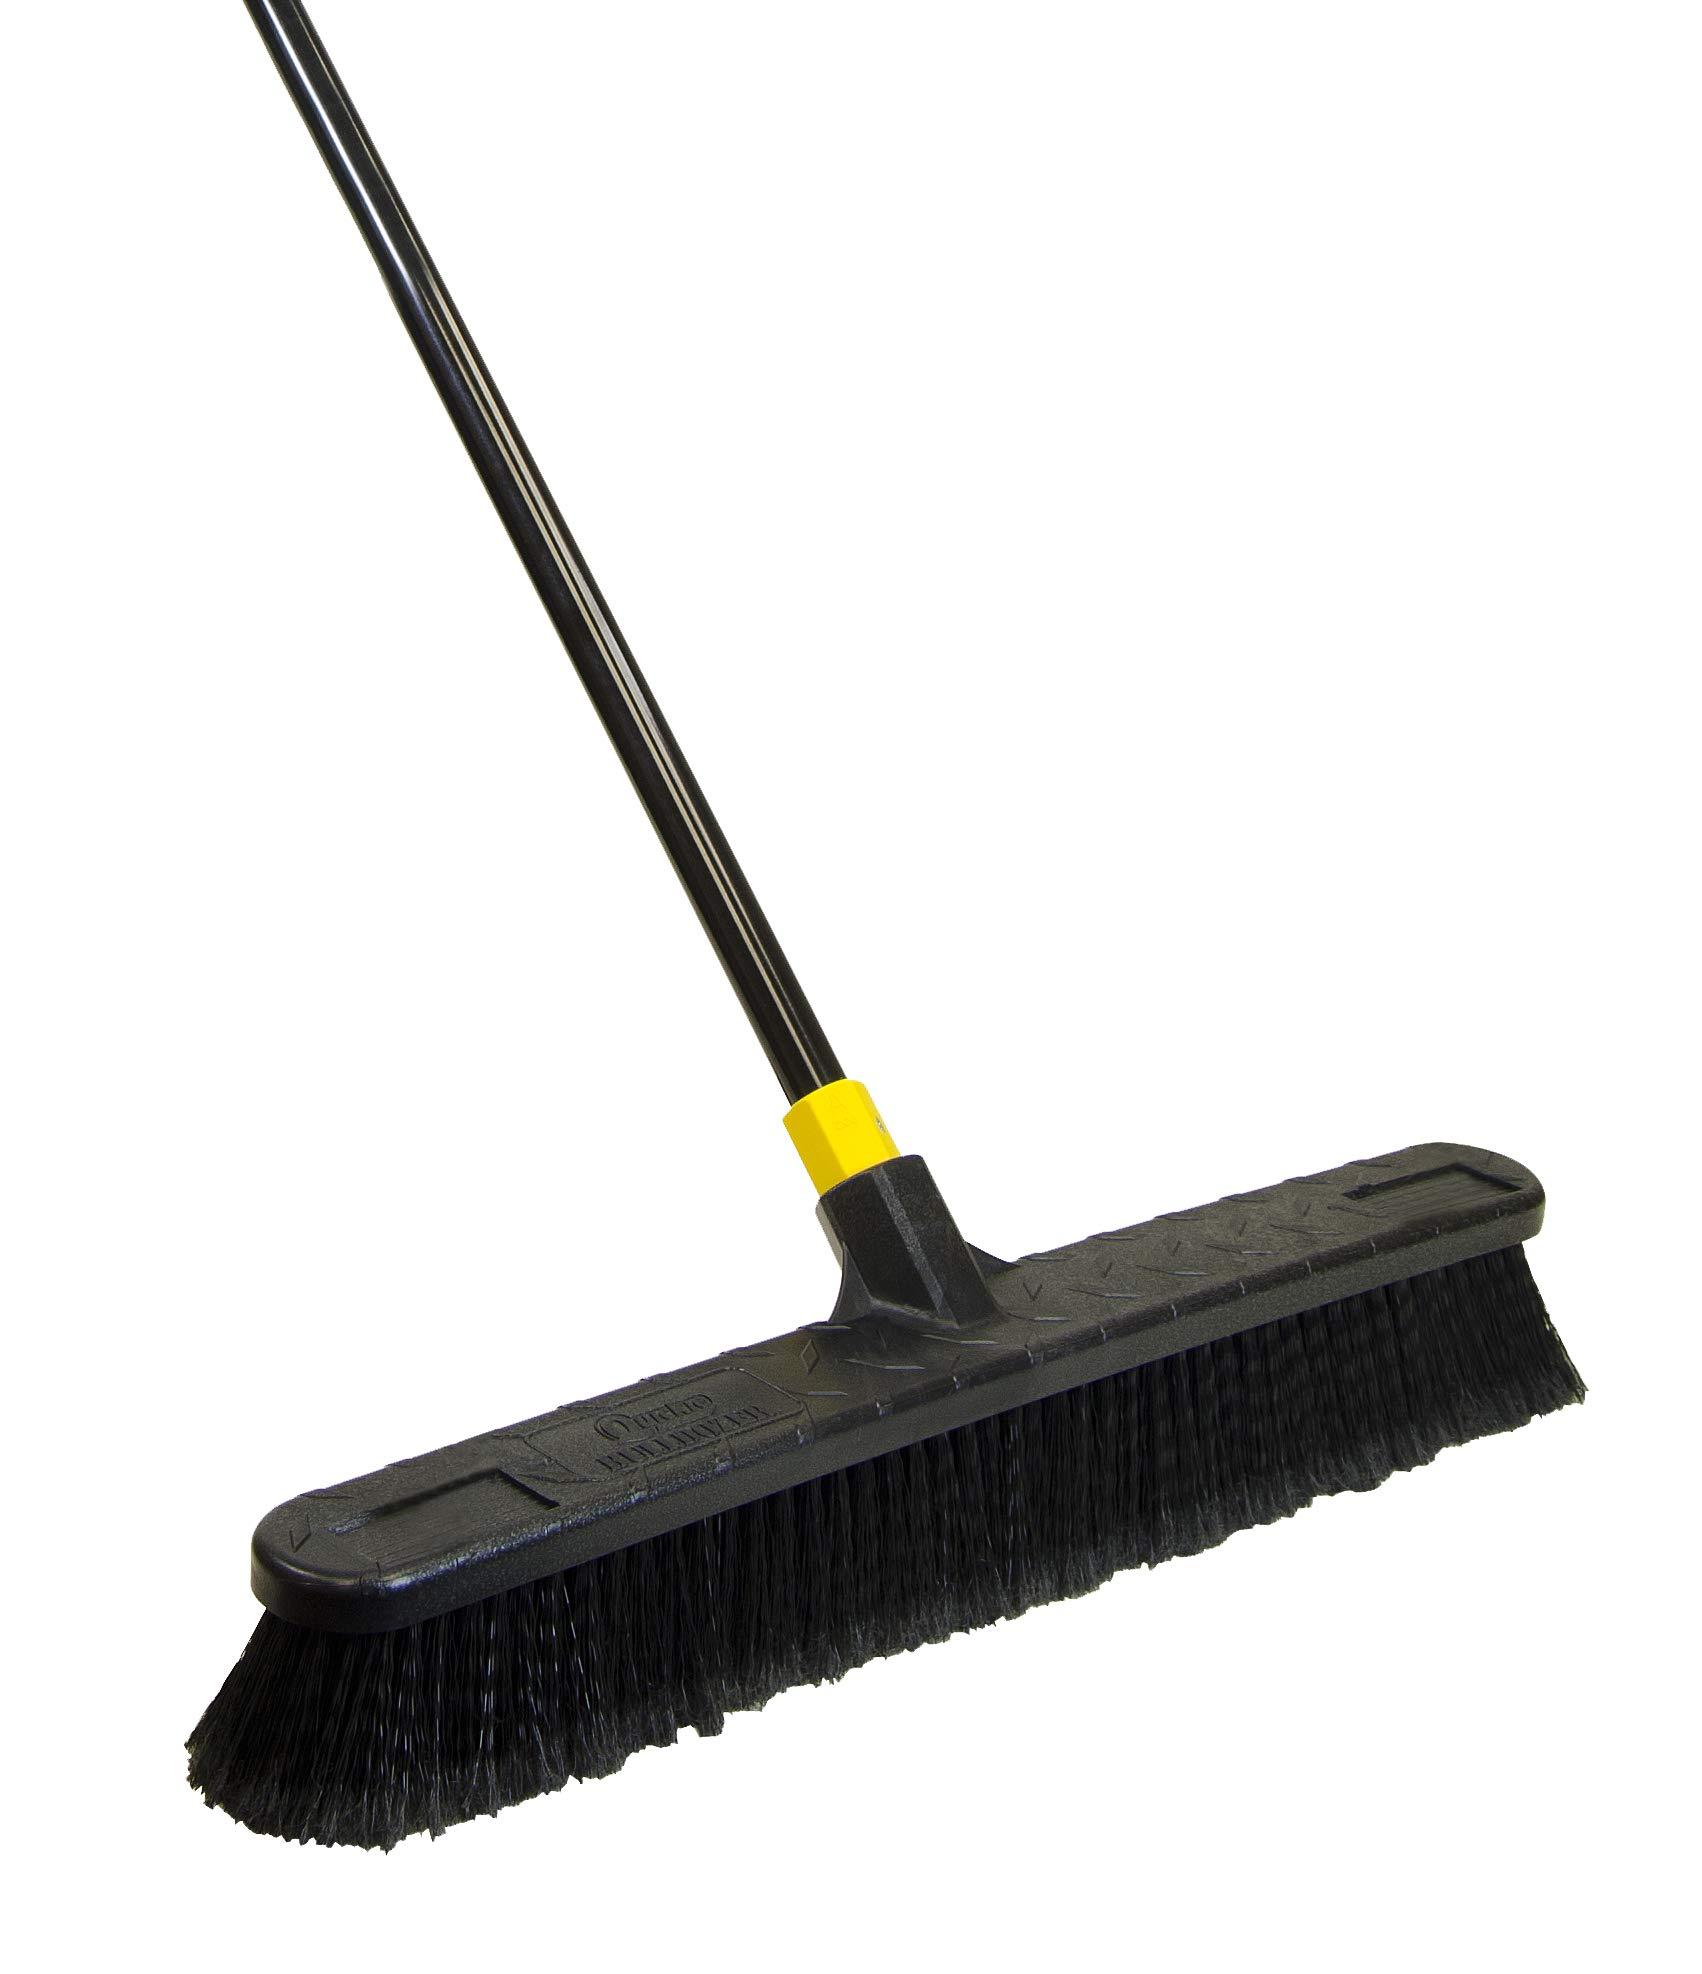 Quickie Quckie Push Broom, 1 Pack, Black - 594 by Quickie